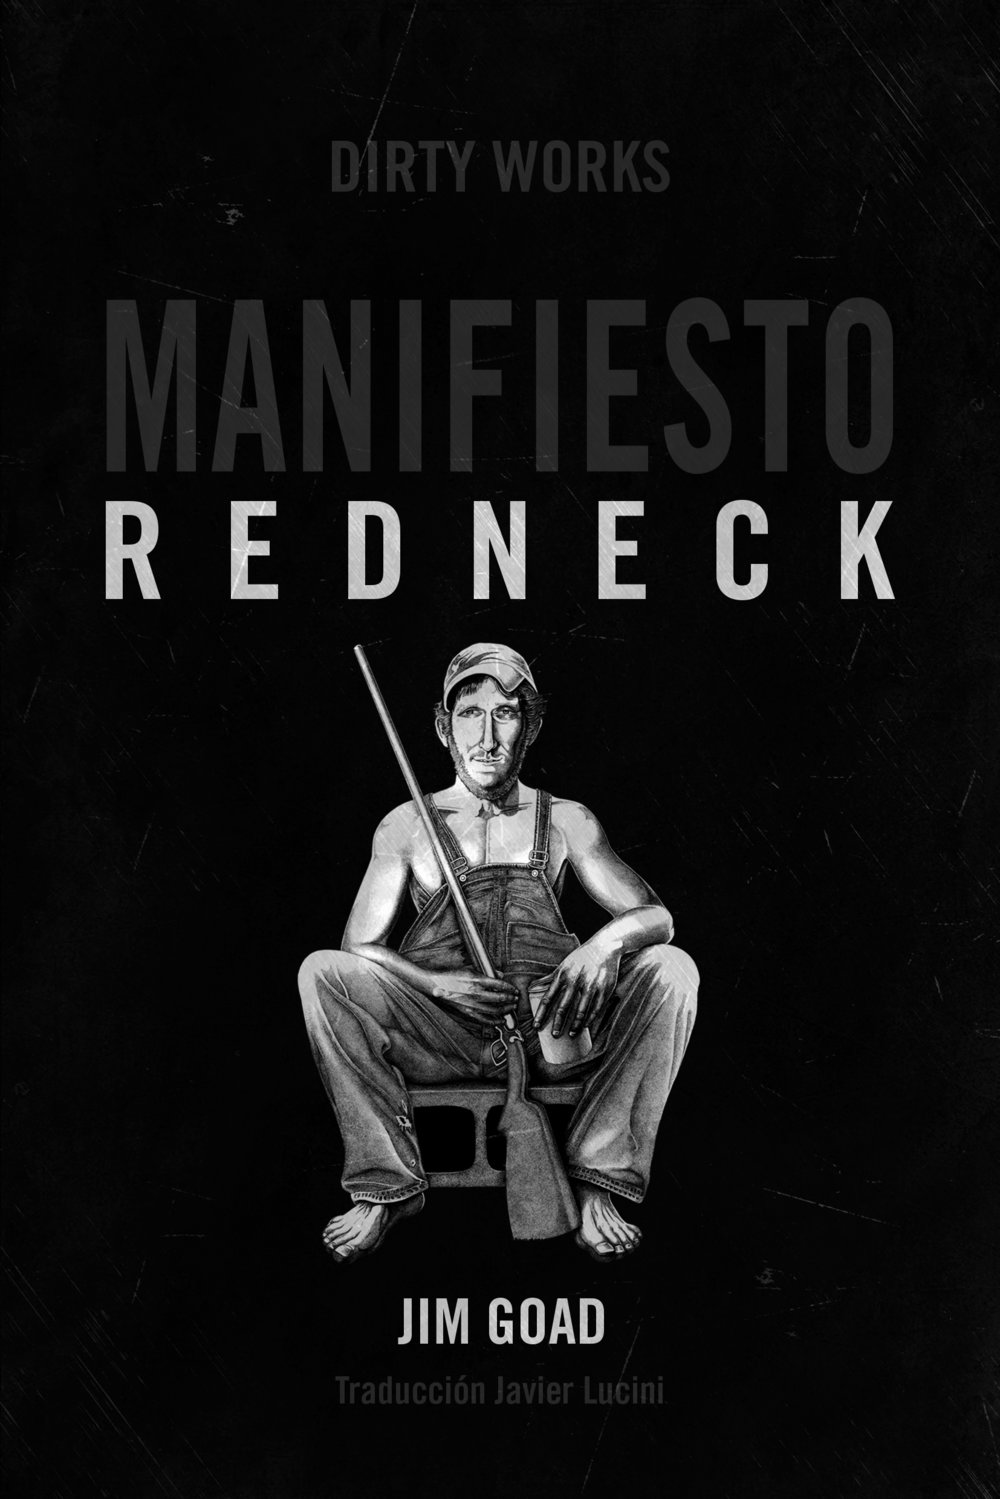 Cubierta-Manifiesto-Redneck.jpg